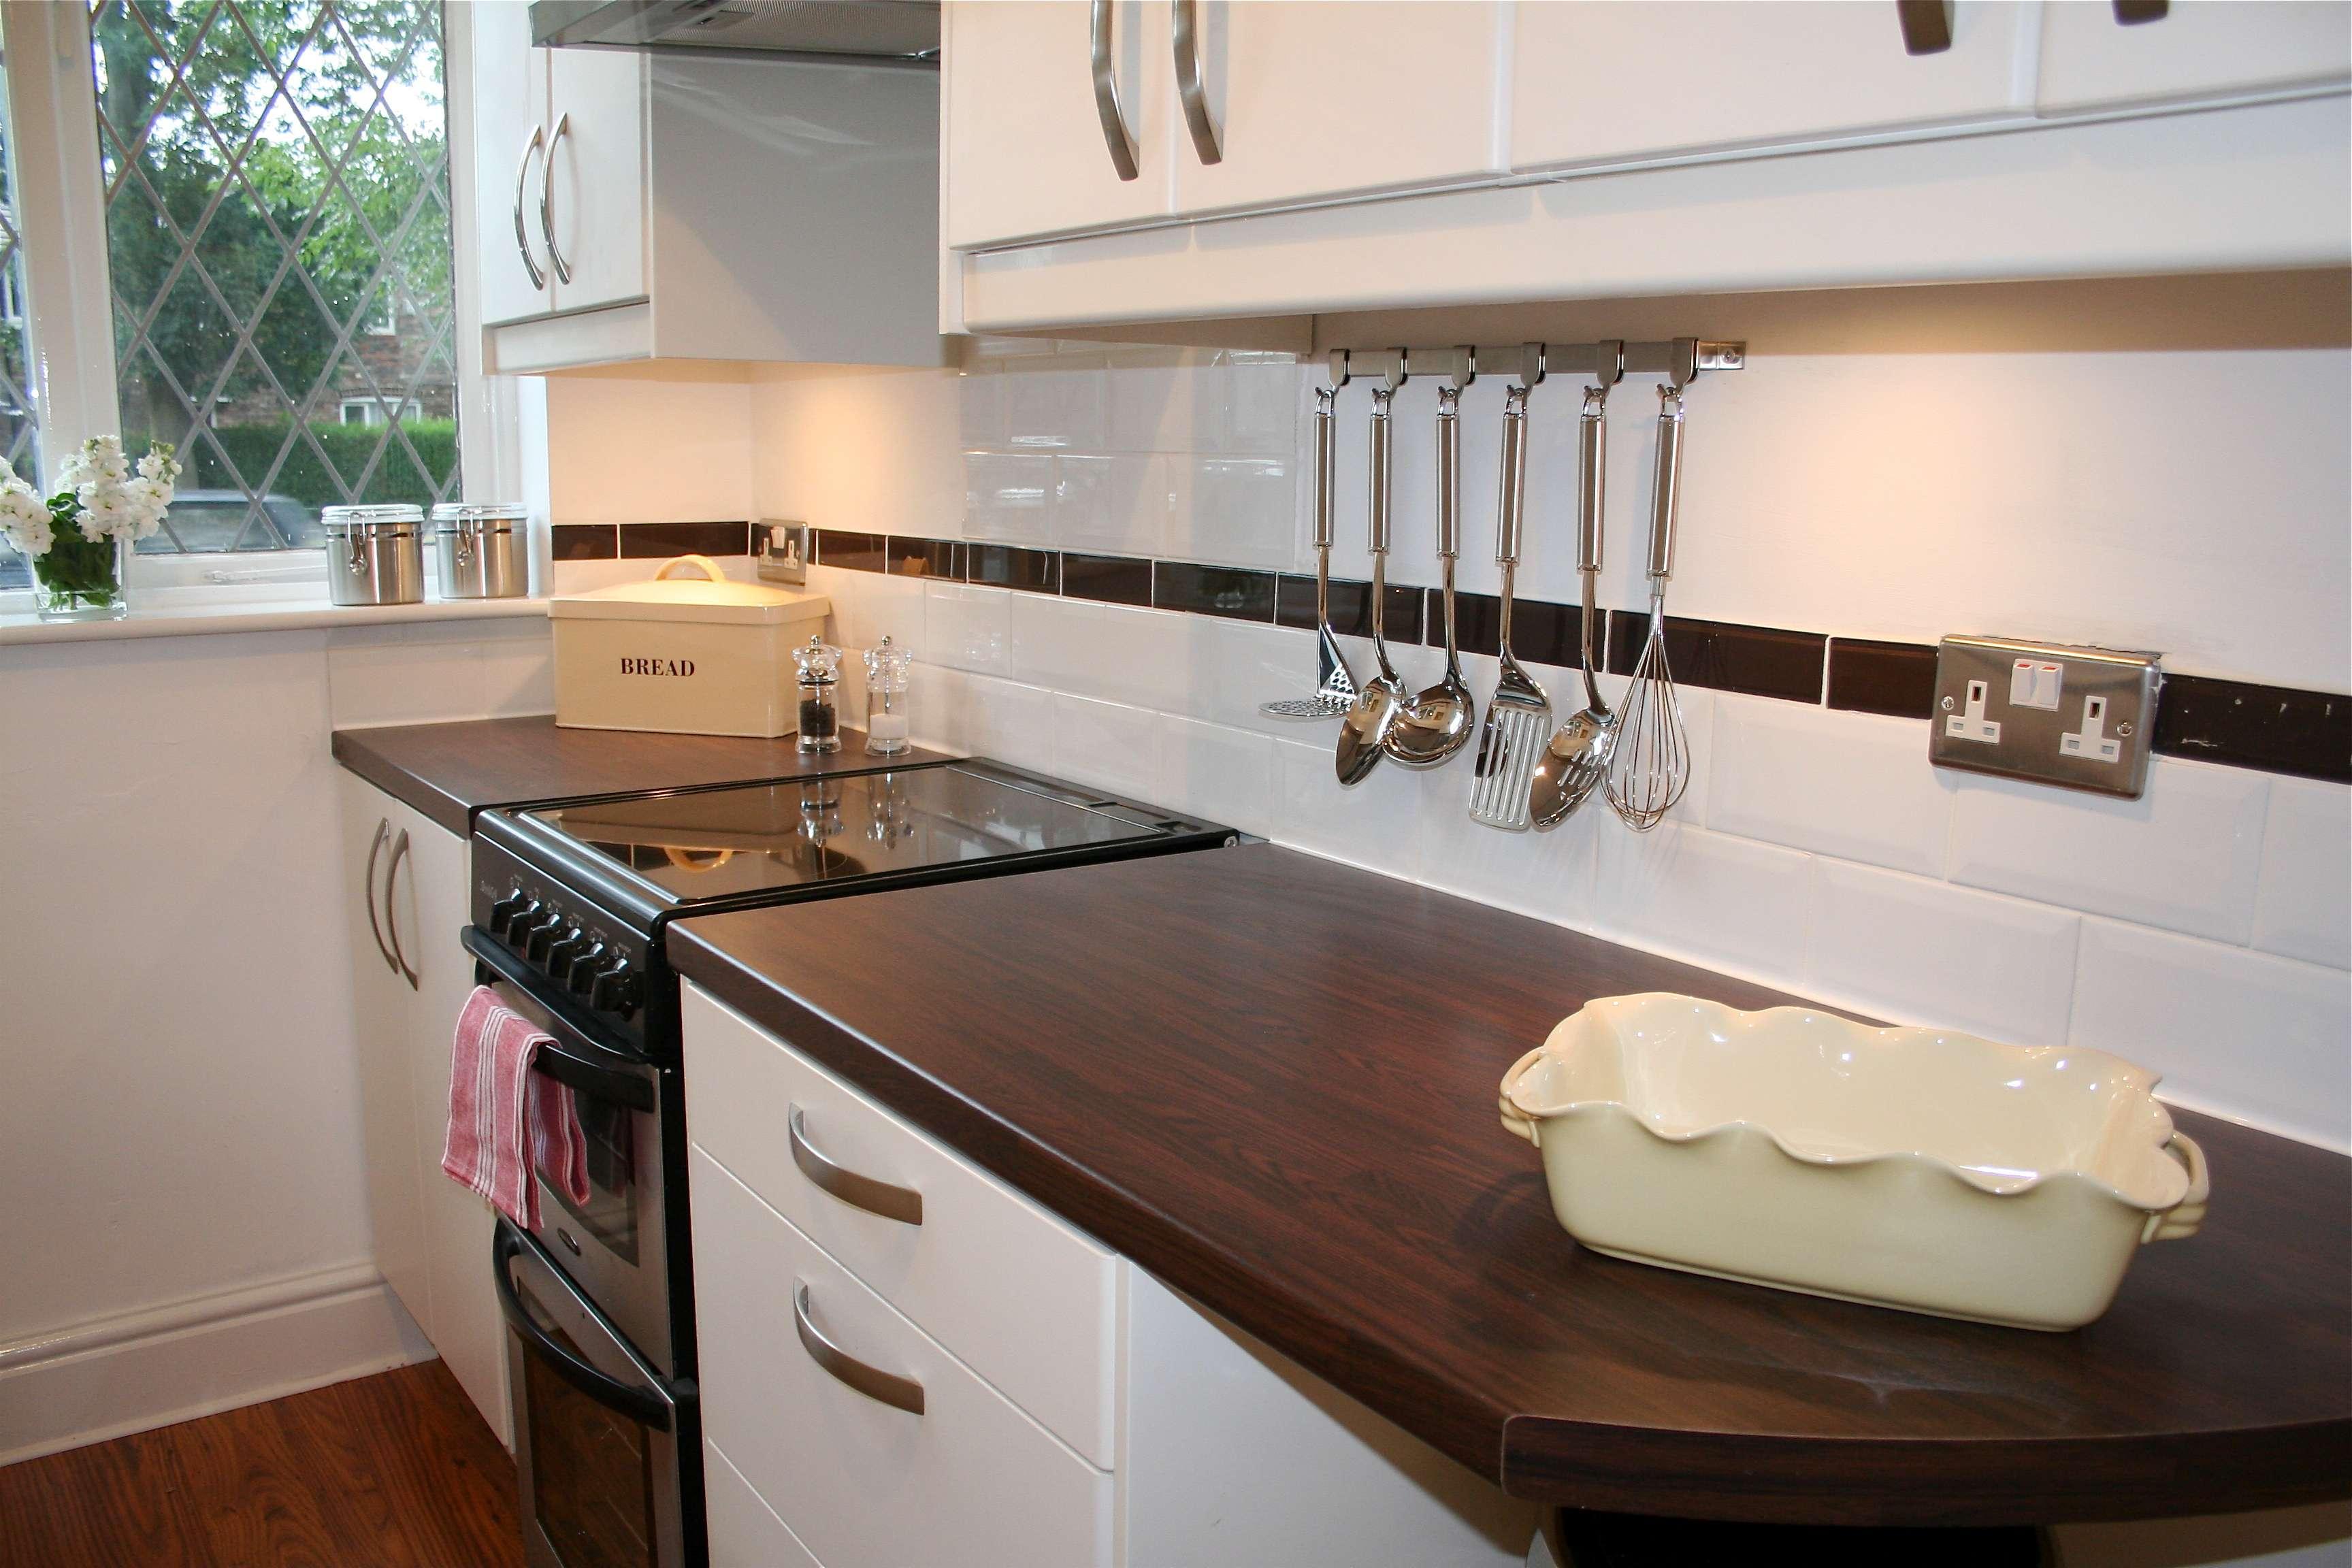 Diy Project Focus Fit Kitchen Worktop